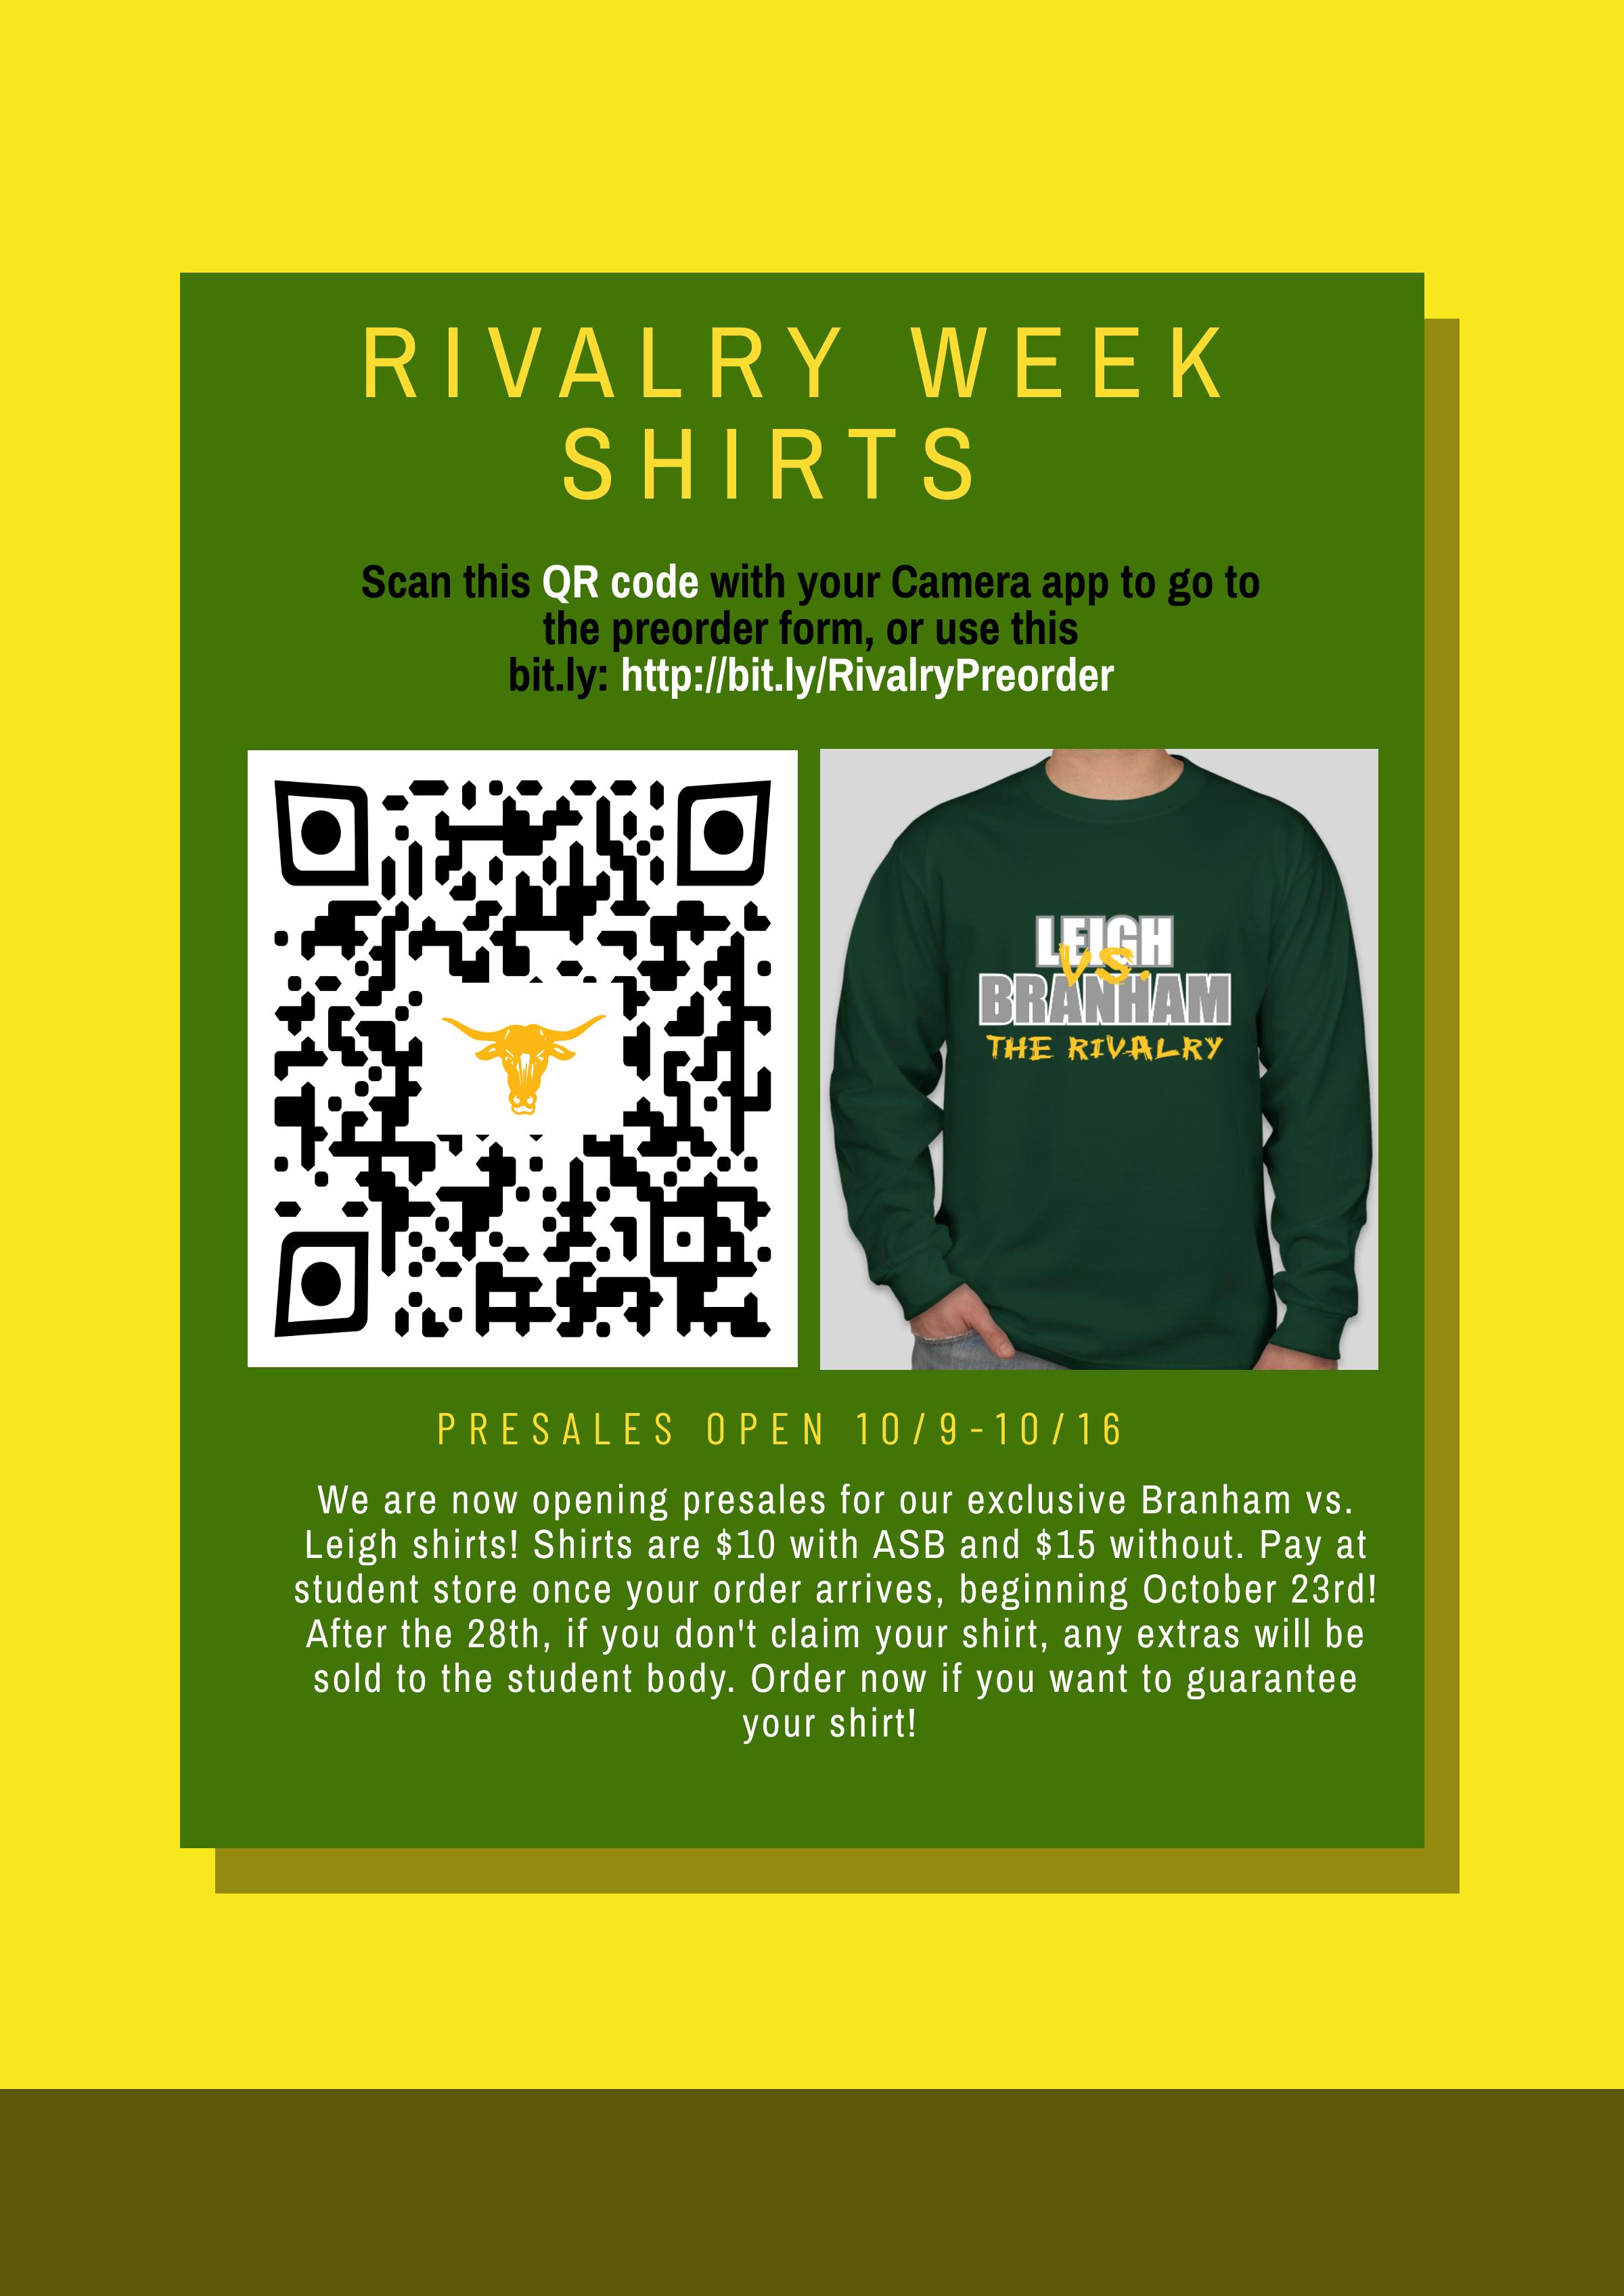 Rivalry Week Shirt